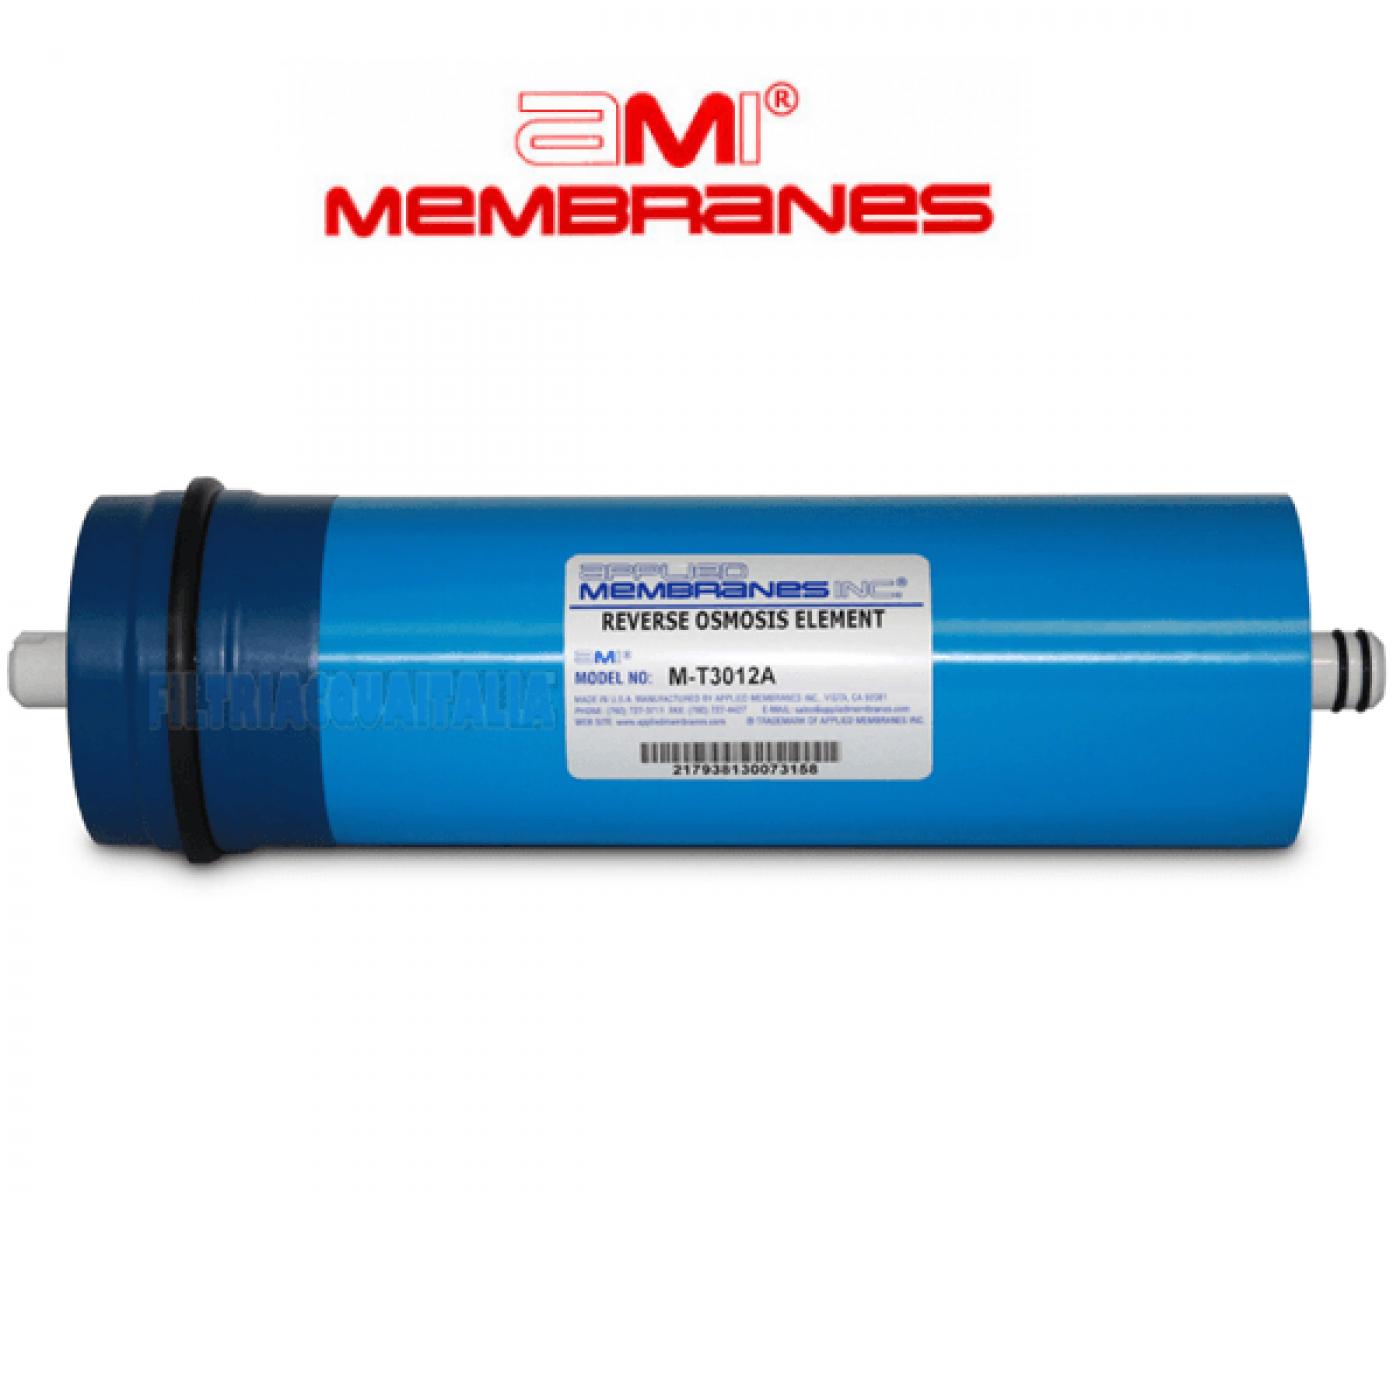 MEMBRANA TFC 3012 300 GPD AMI PER DEPURATORE